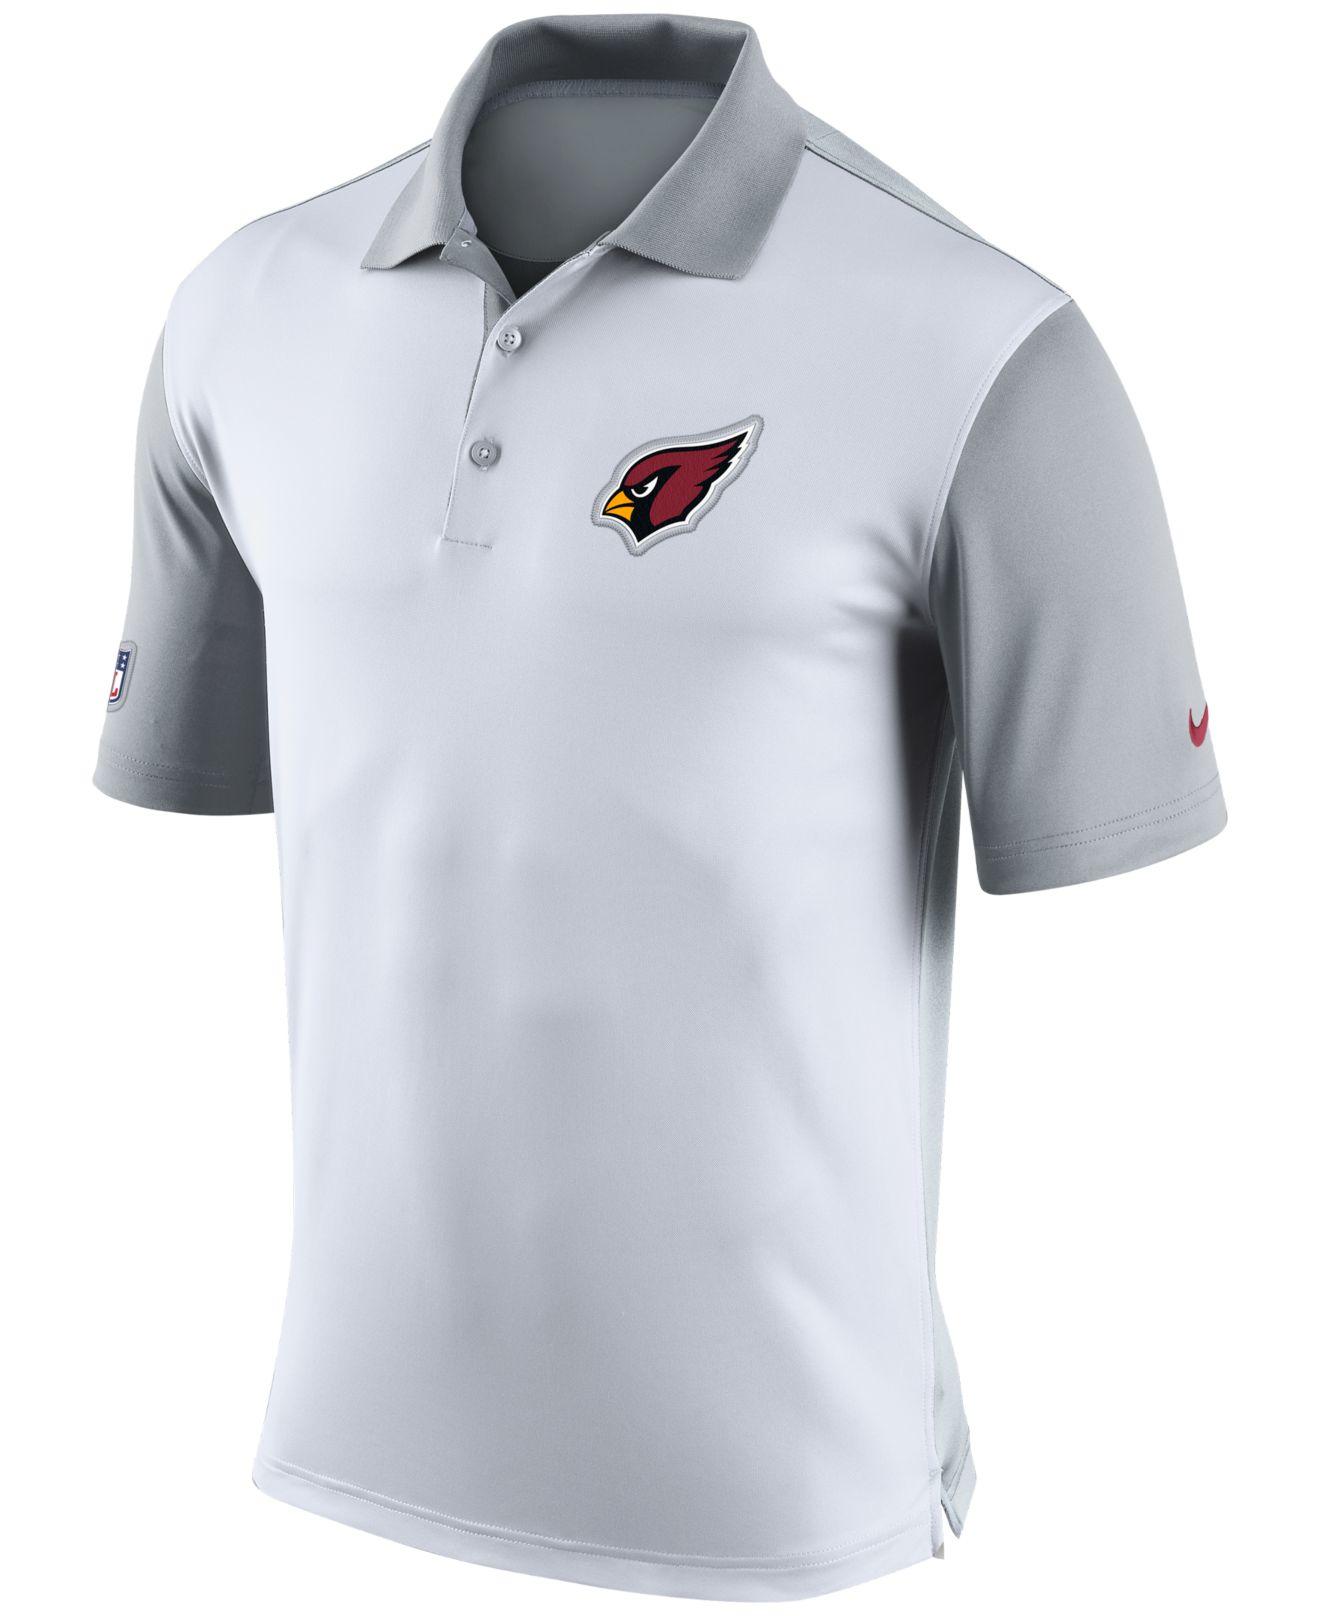 73e91e457d30 Lyst - Nike Men s Arizona Cardinals Preseason Polo in White for Men